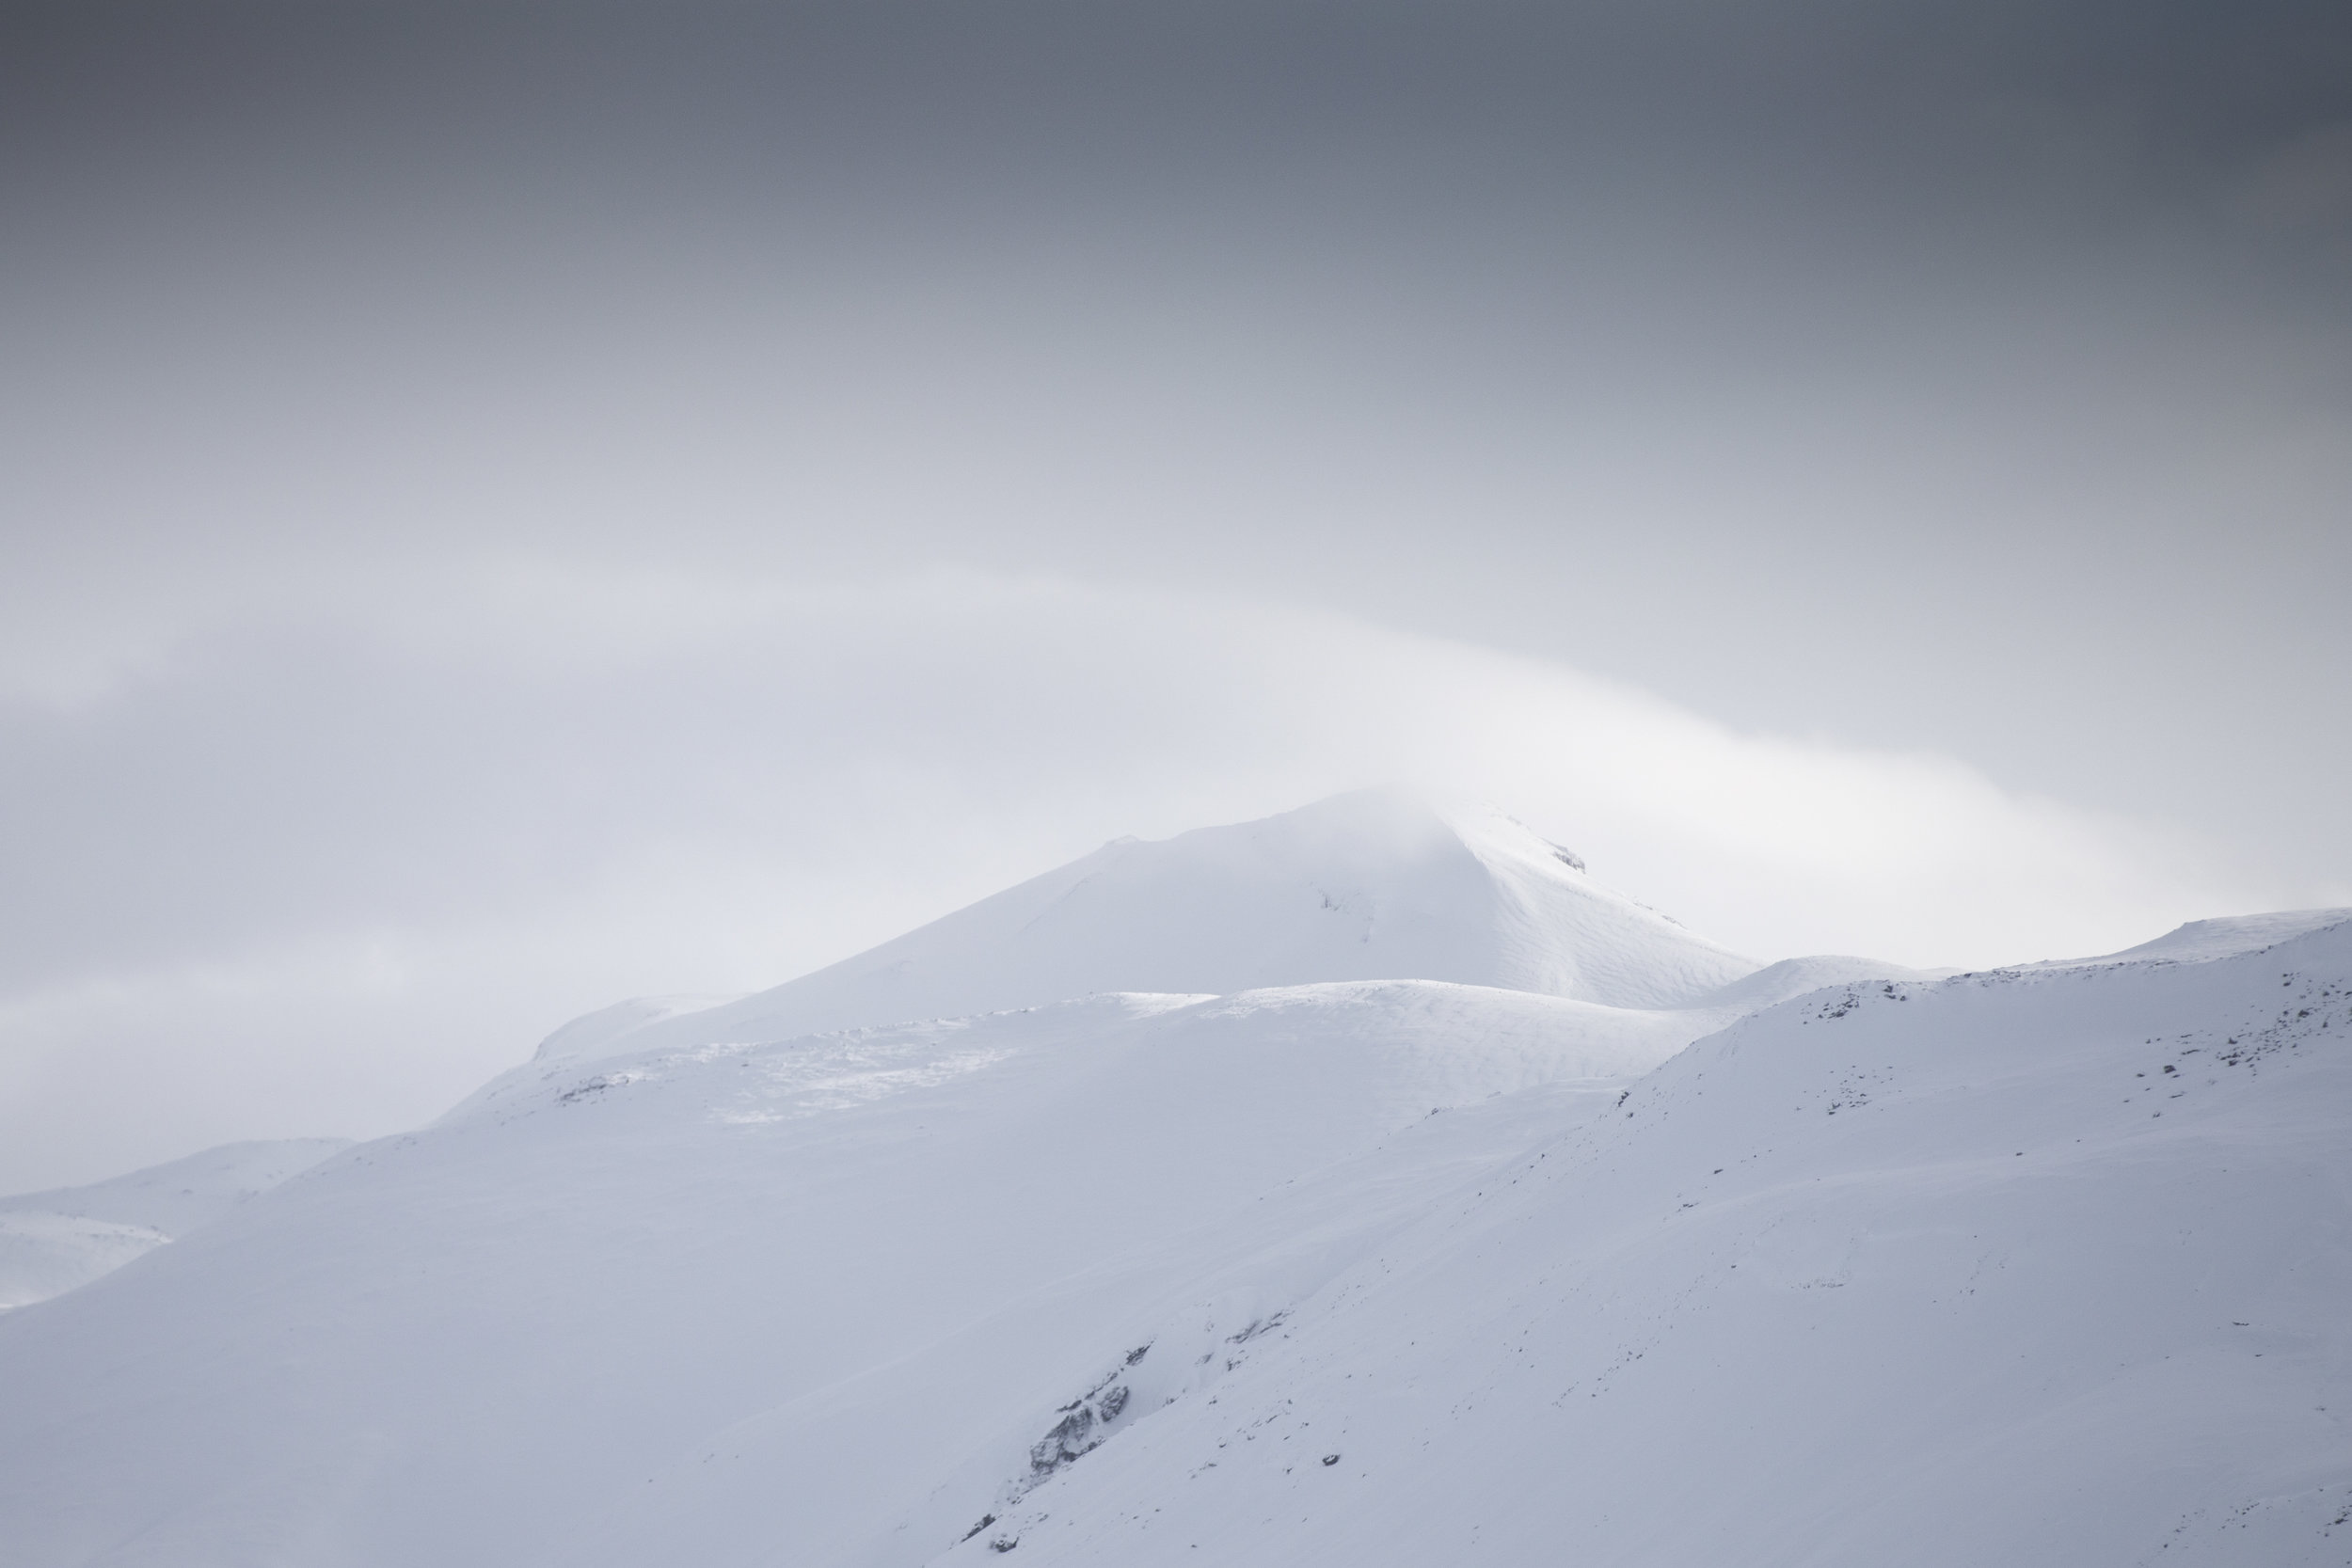 jermiah-schuster-iceland-325.jpg